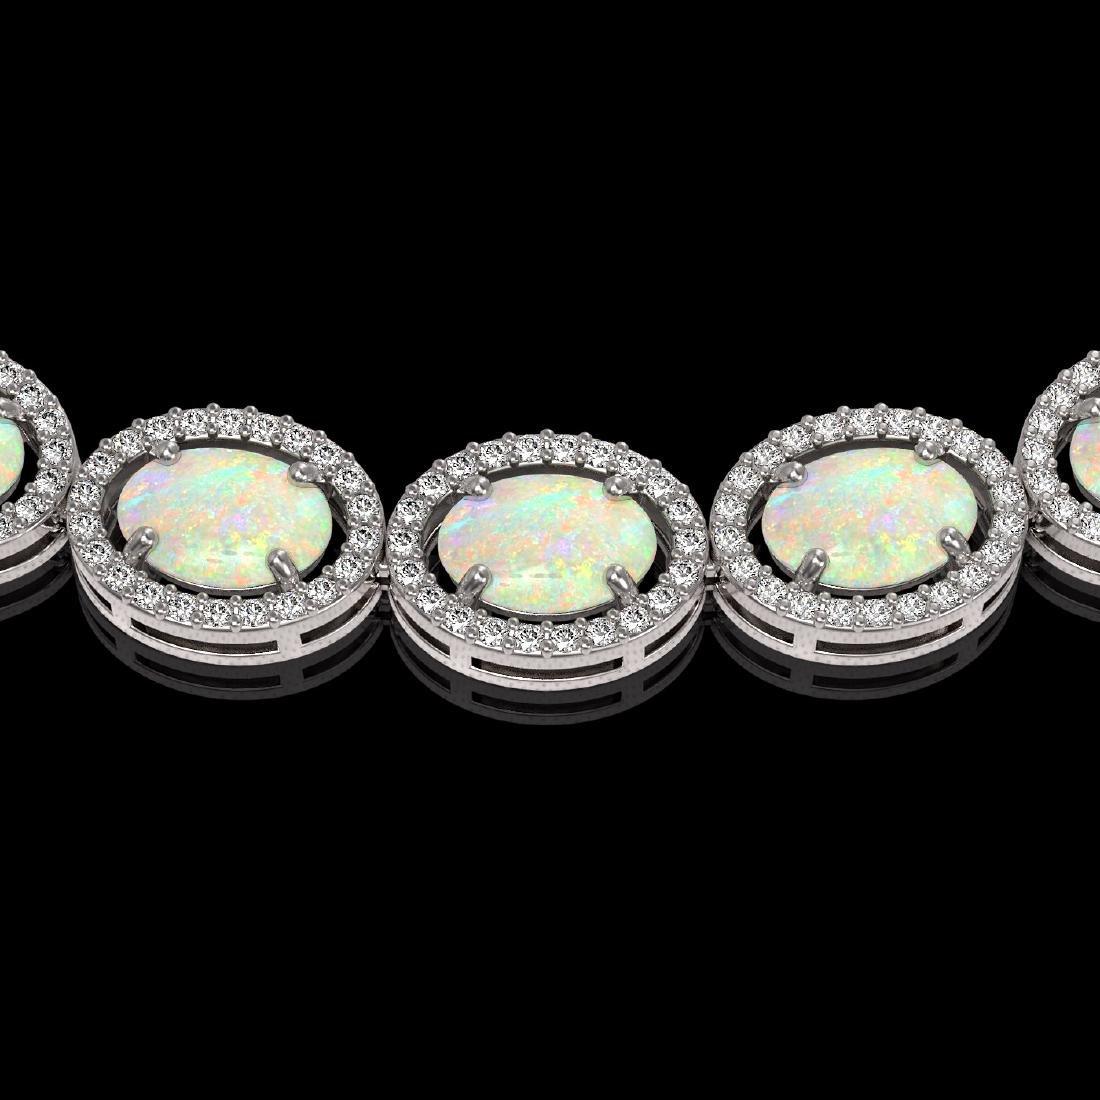 32.42 CTW Opal & Diamond Halo Necklace 10K White Gold - 3